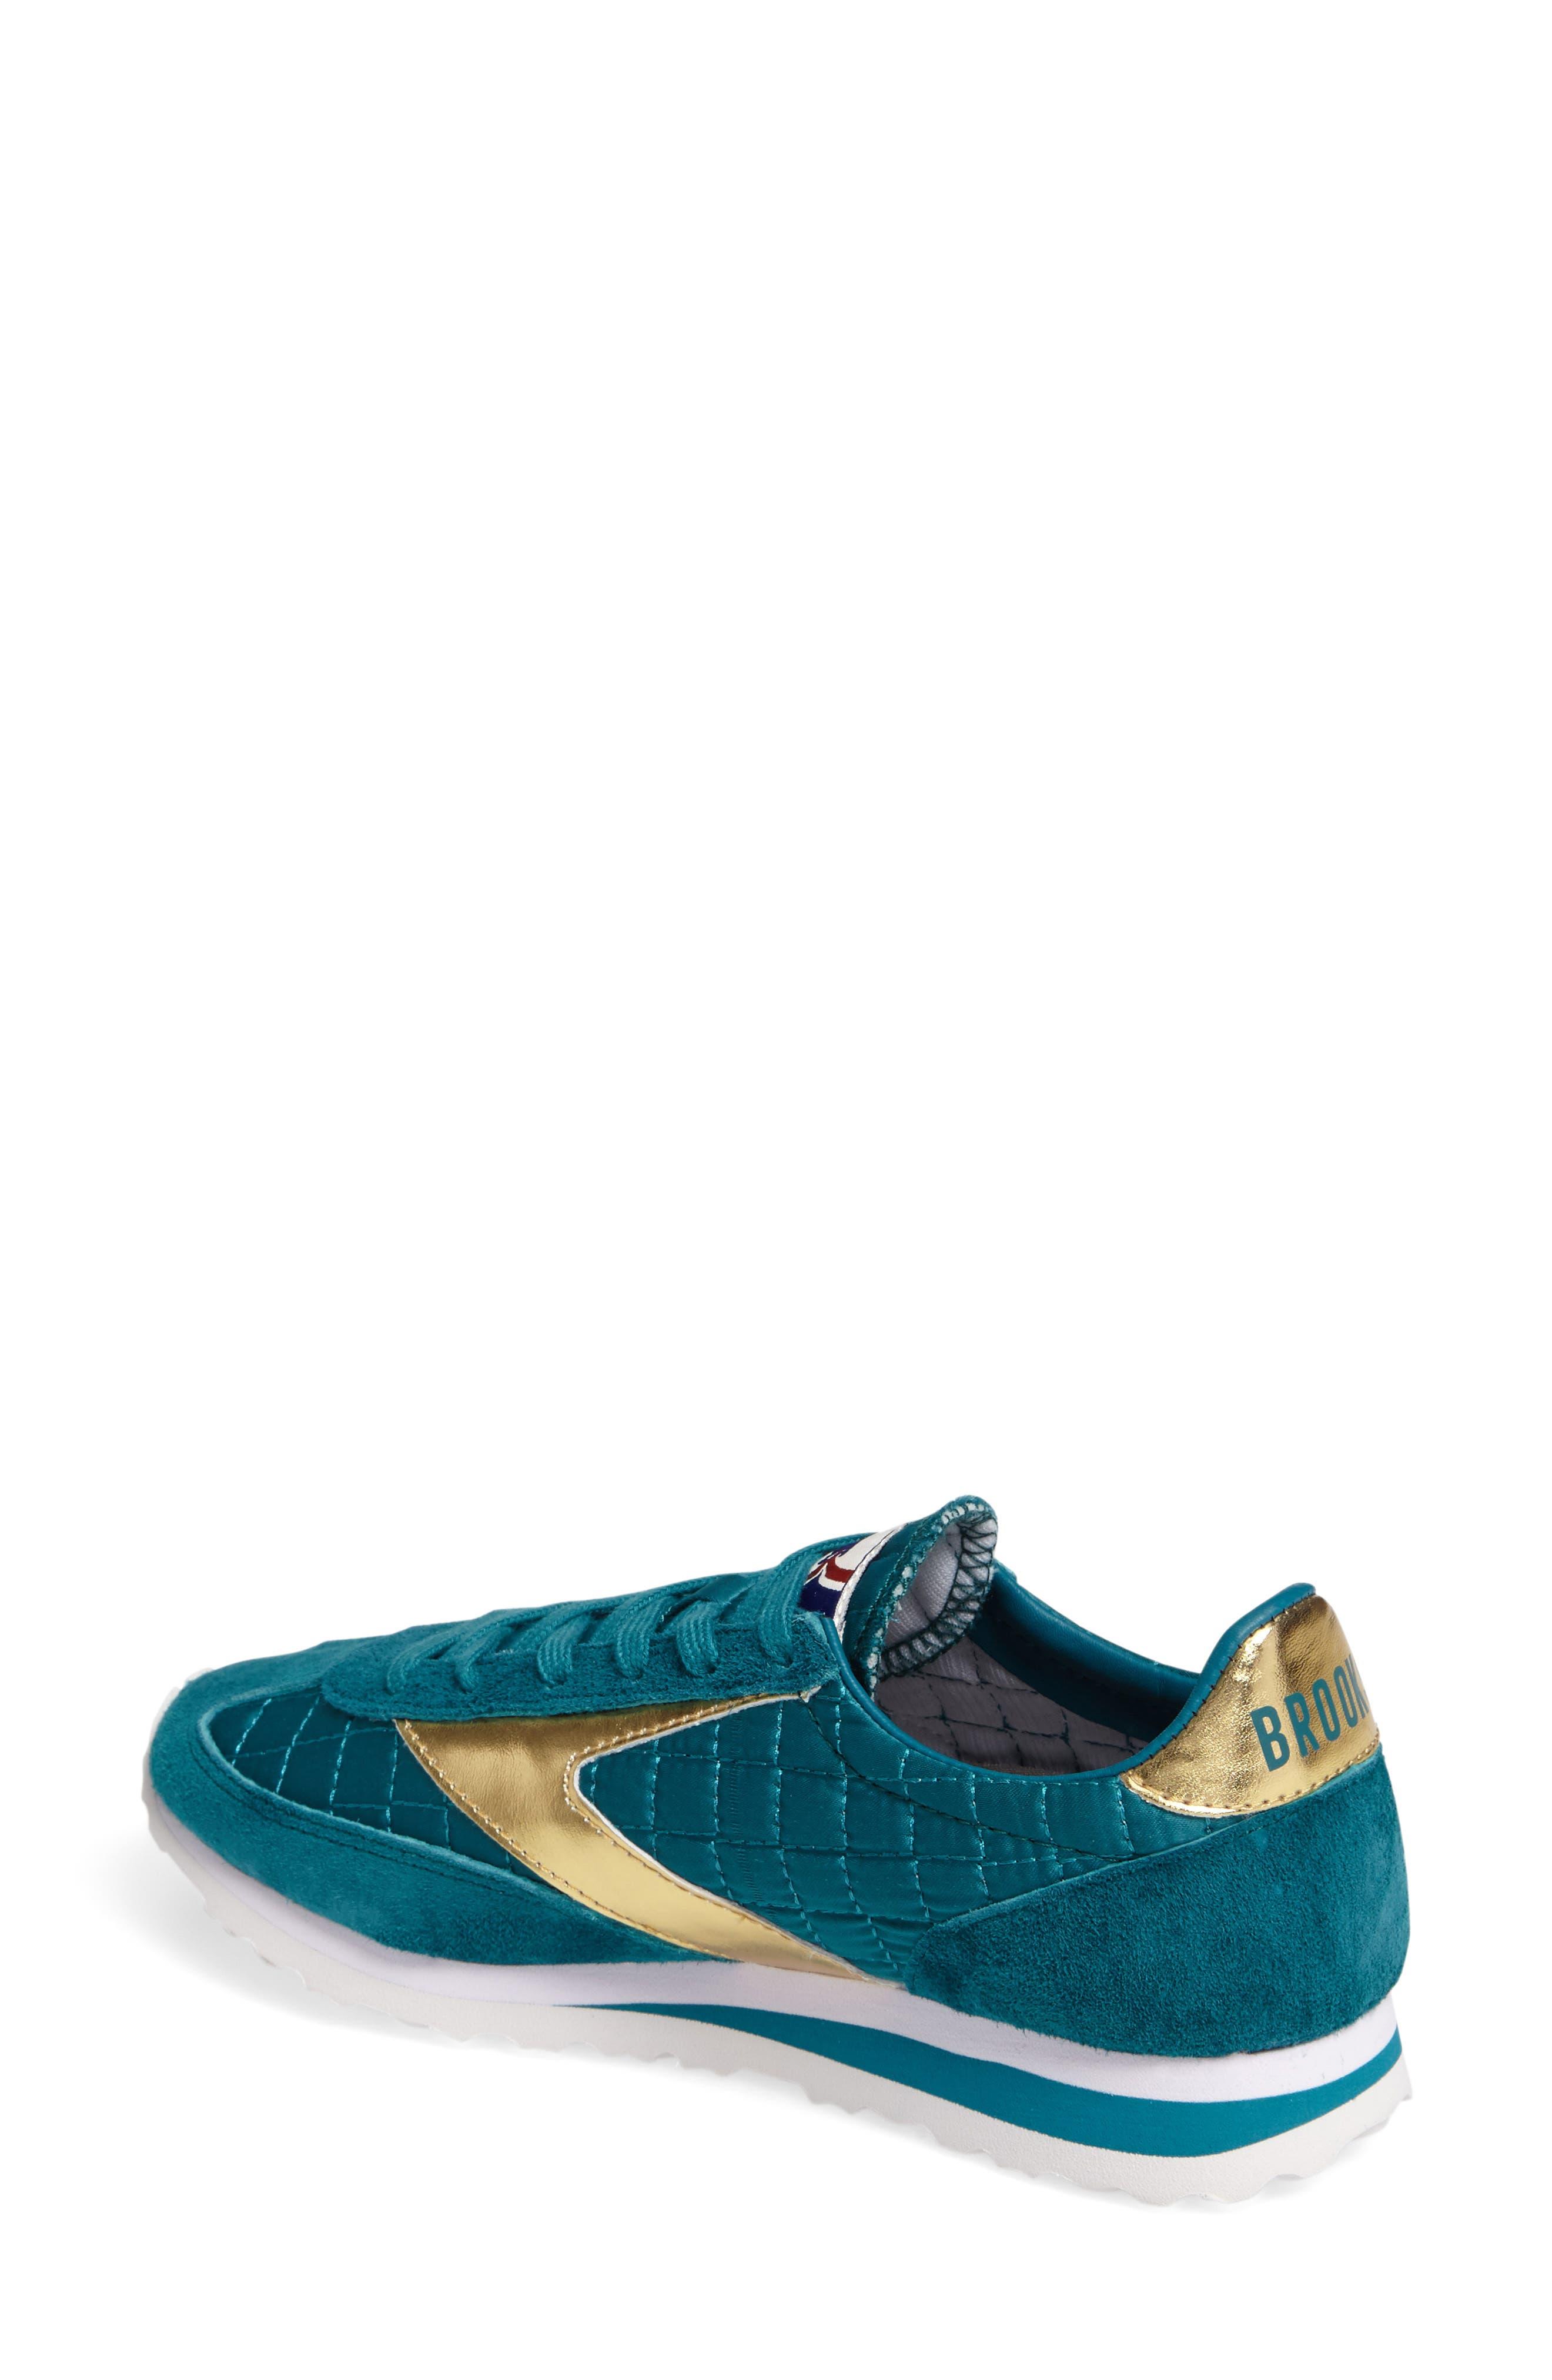 'Vanguard' Sneaker,                             Alternate thumbnail 69, color,